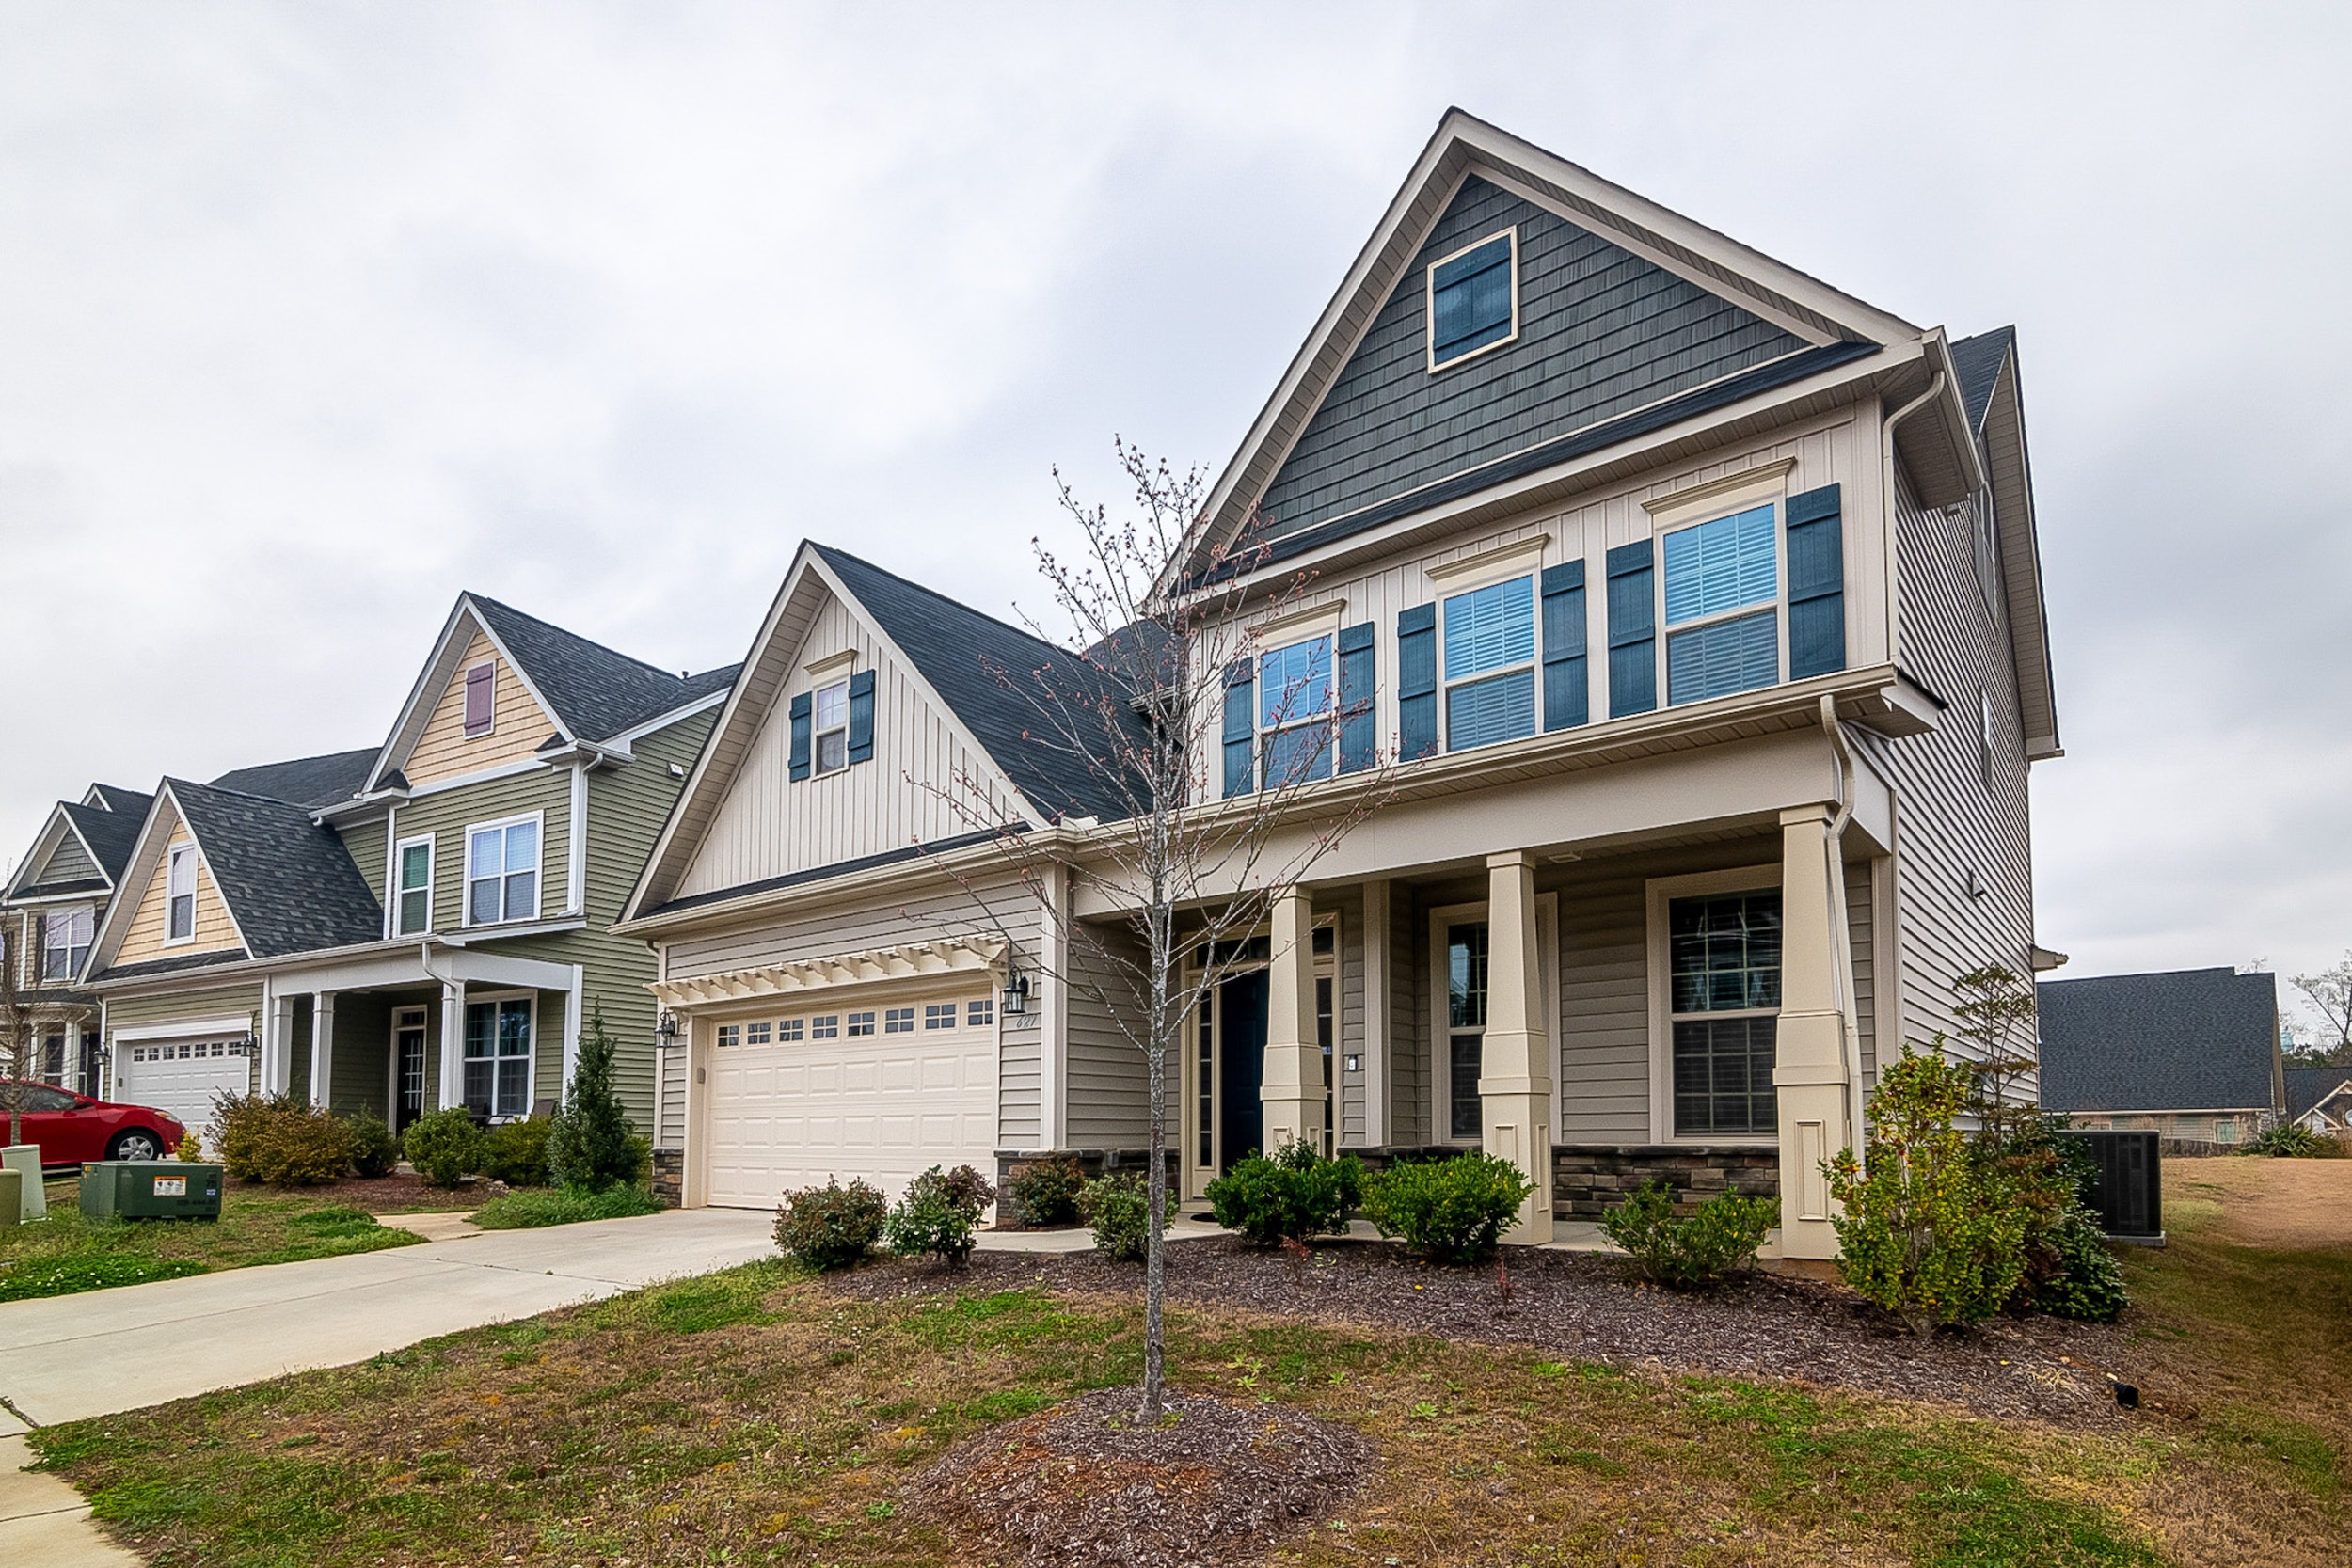 Modern, single family homes in a neighborhood.